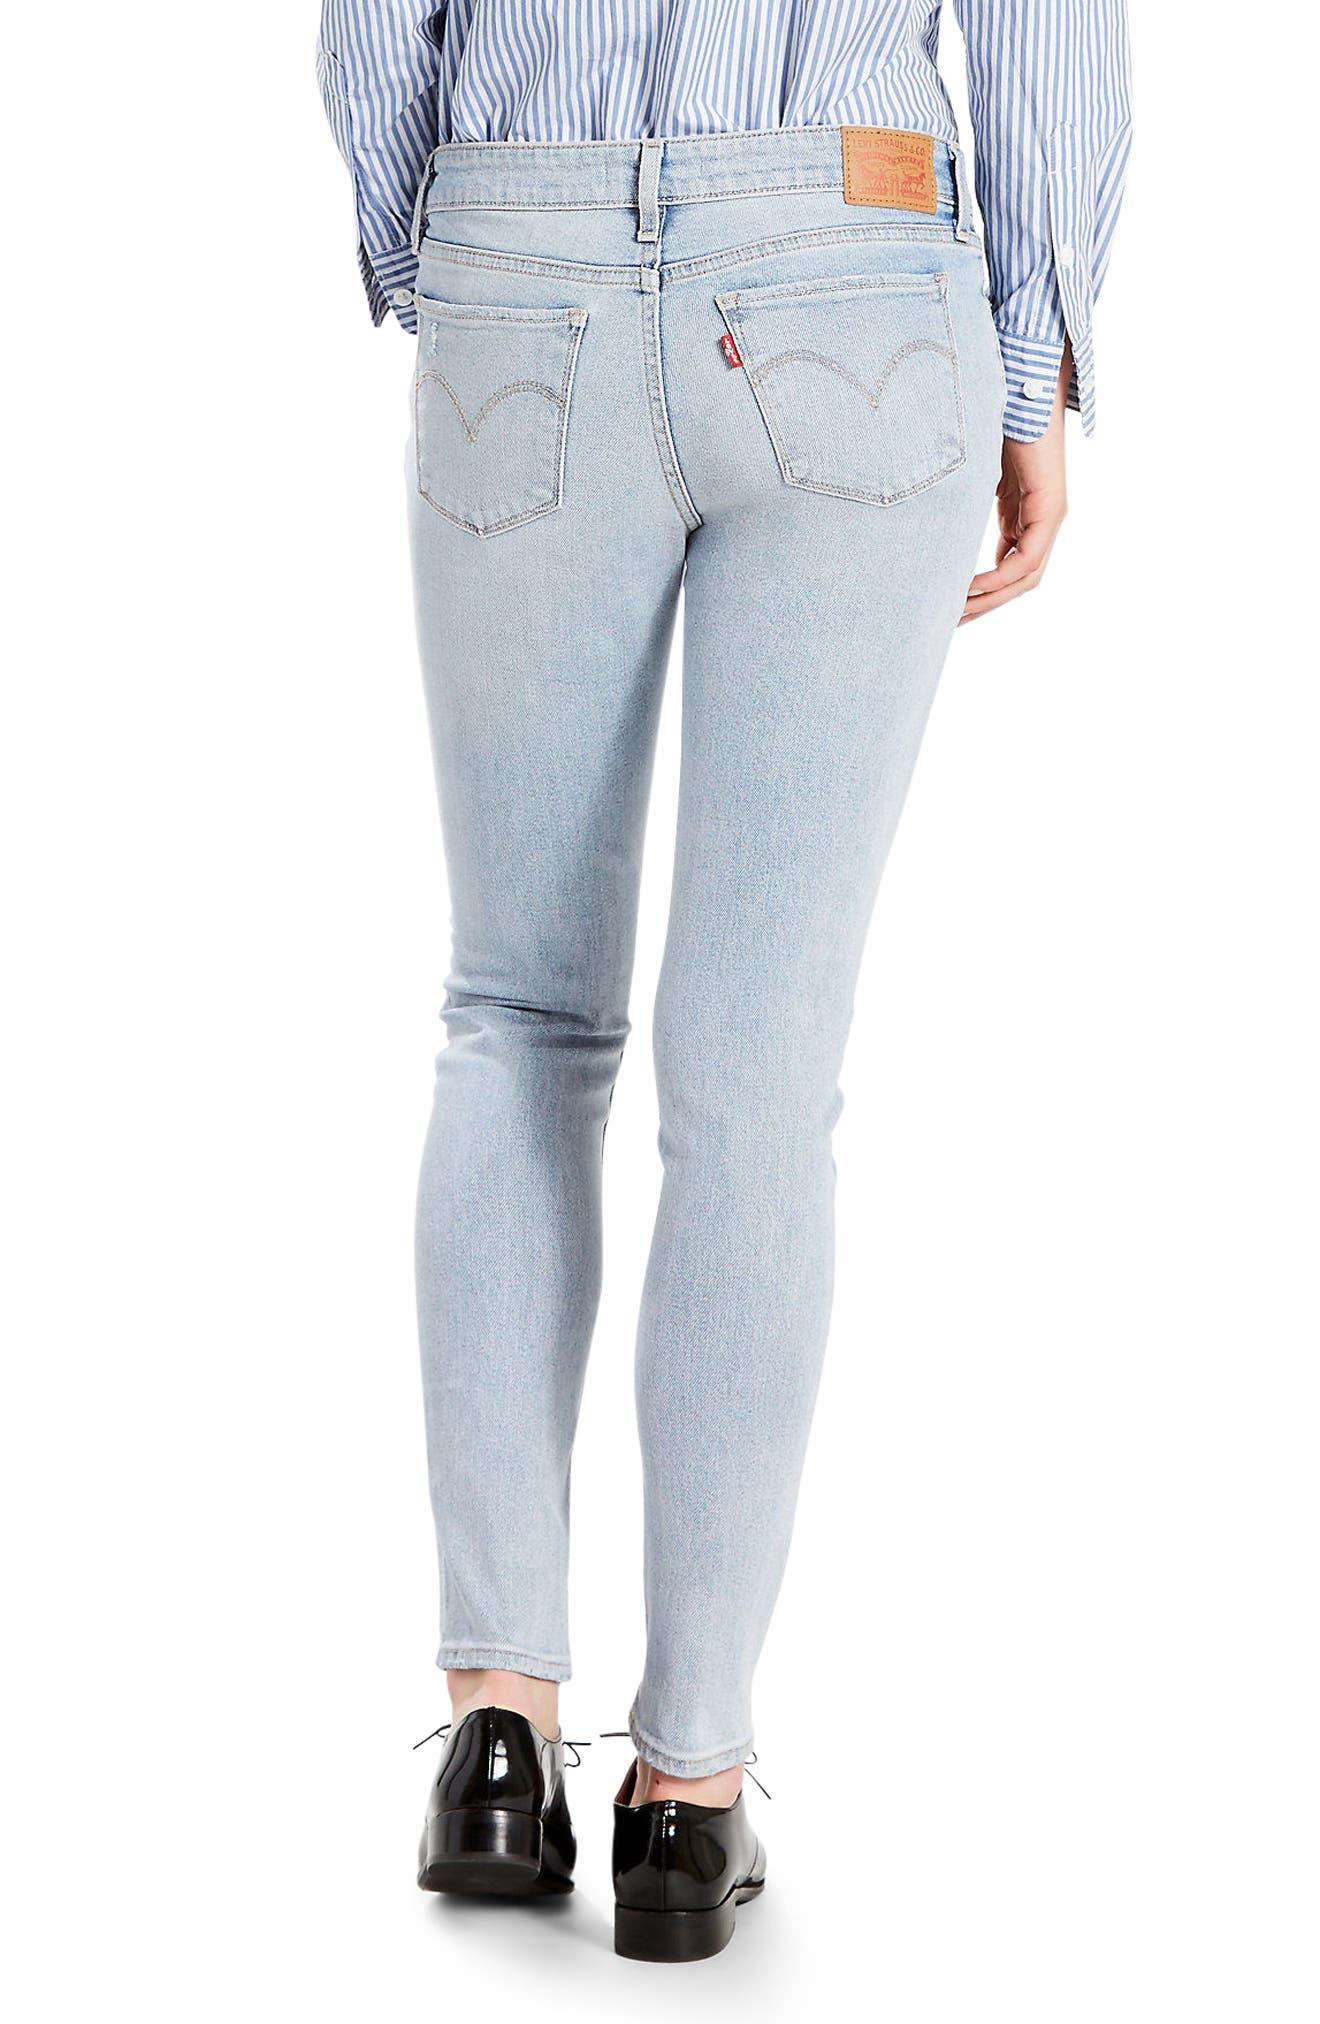 711 Skinny Jeans,                             Alternate thumbnail 2, color,                             420